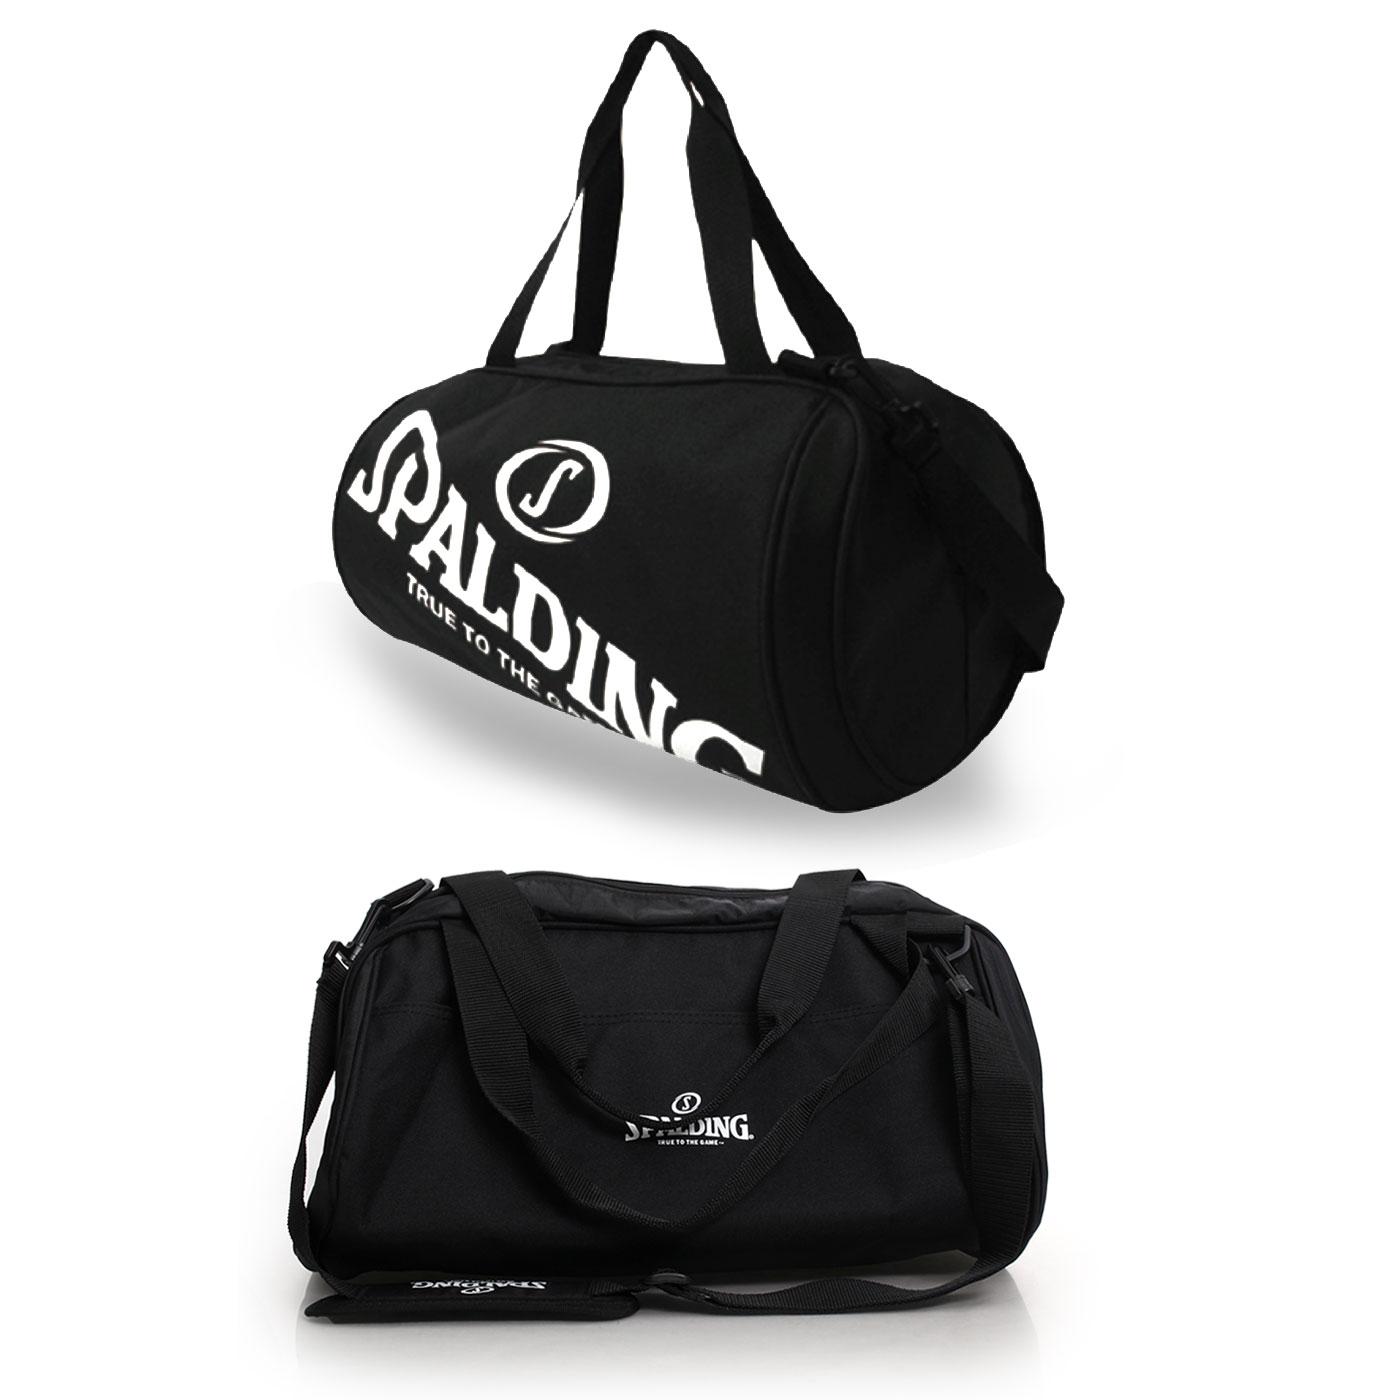 SPALDING 二顆裝休閒兩用袋(側背包 籃球袋 肩背包 NBA【05481016】≡排汗專家≡